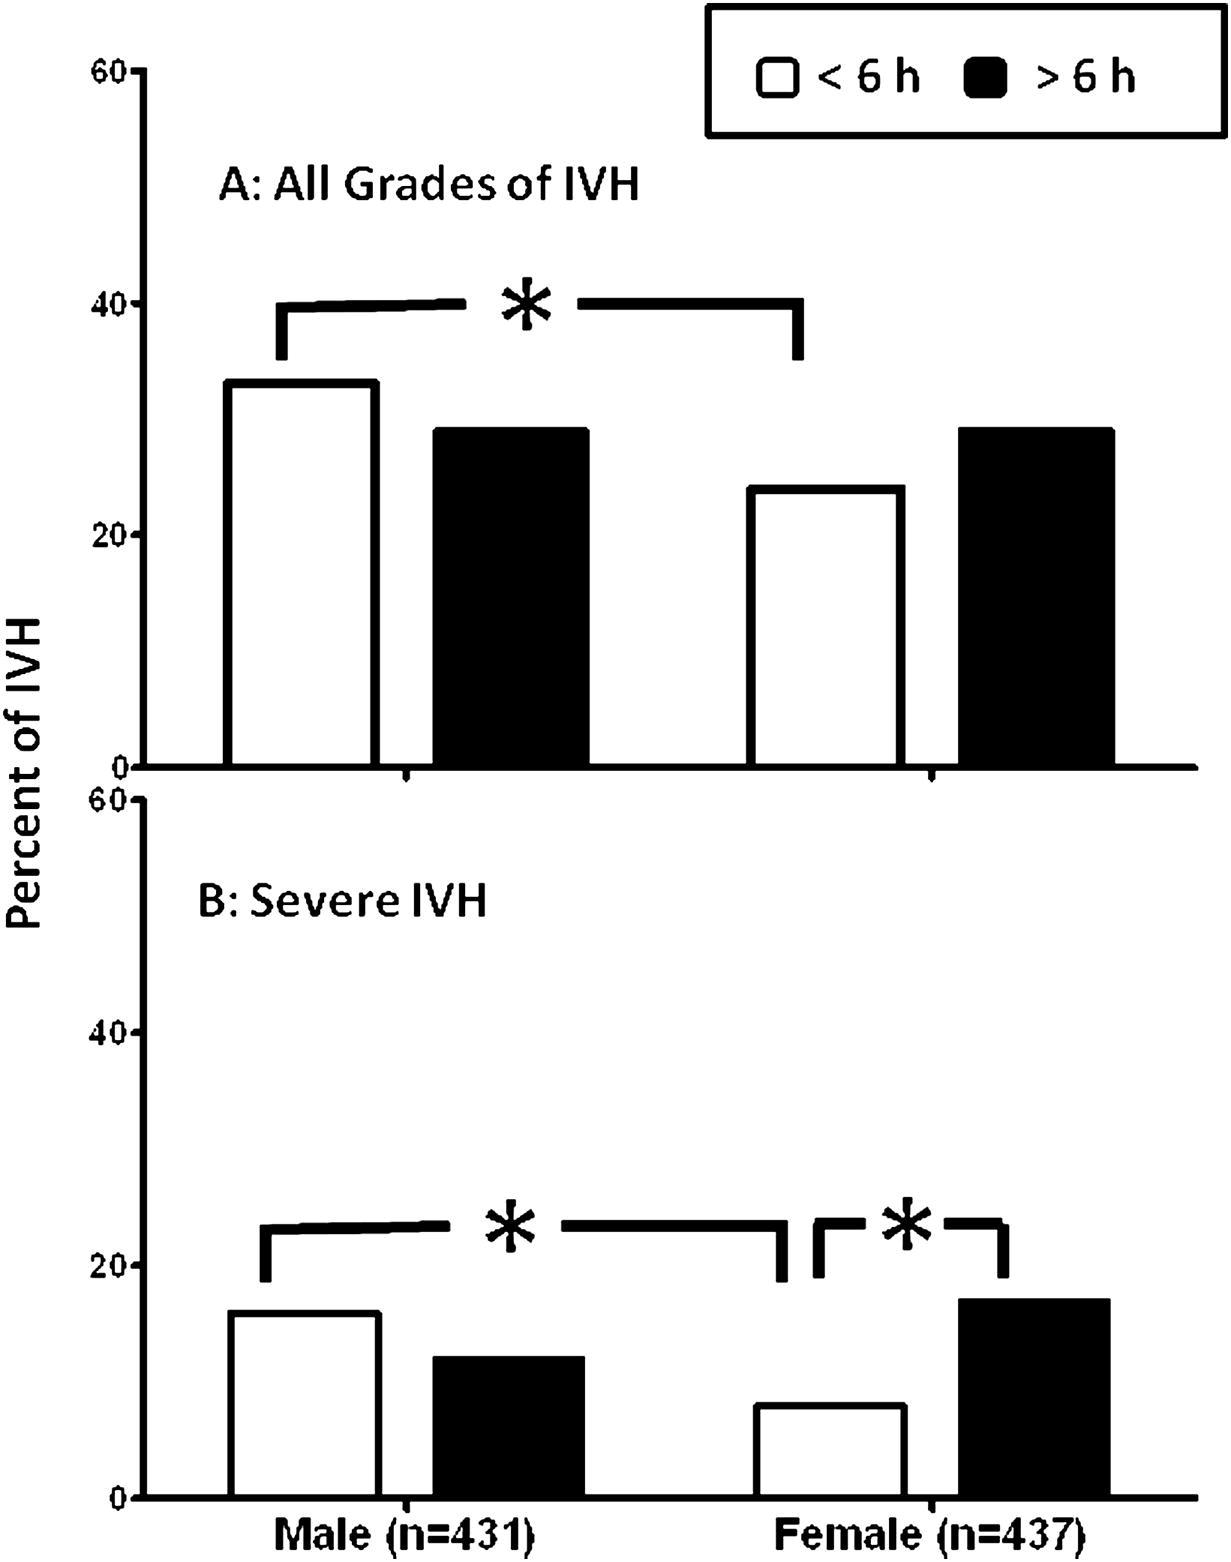 Indomethacin Prophylaxis to Prevent Intraventricular